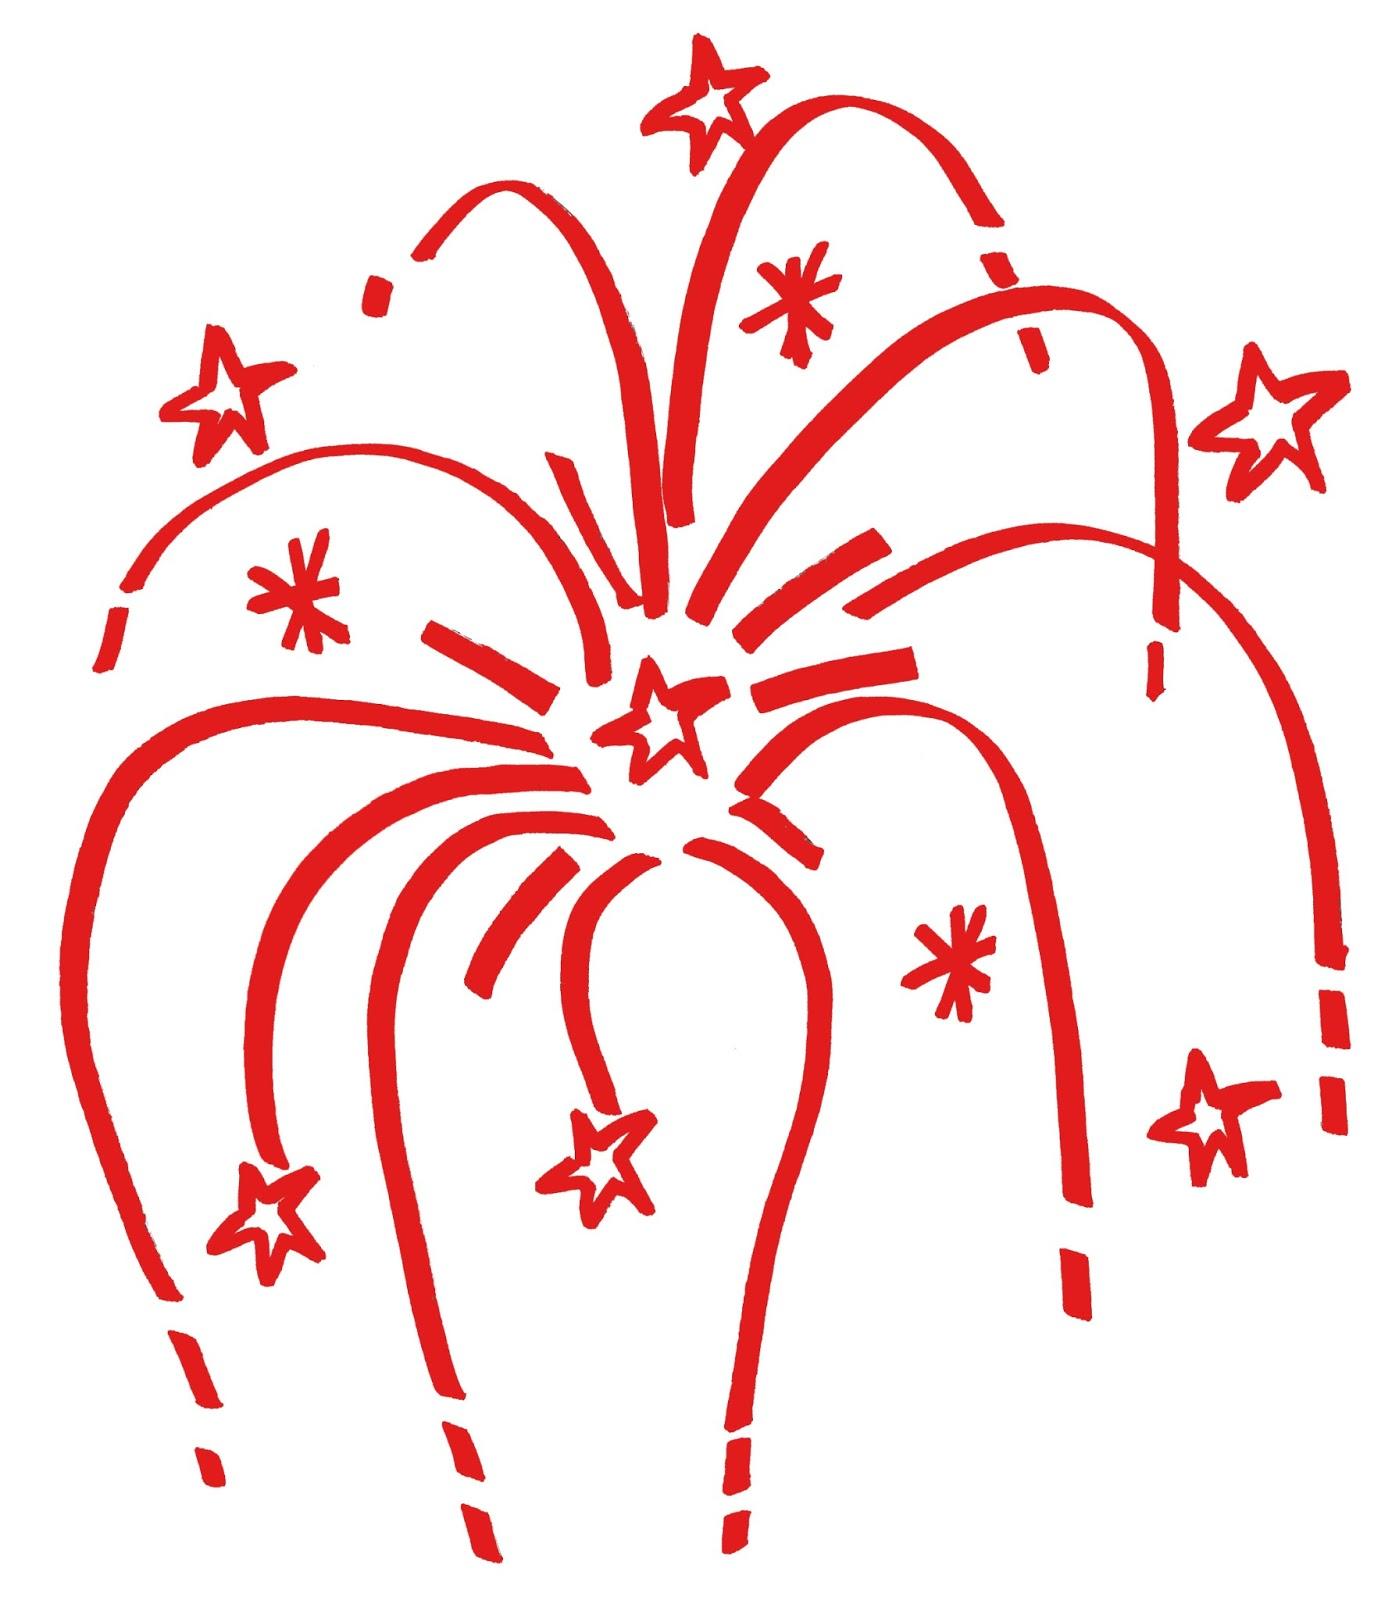 Fireworks clip art fireworks animations clipart famclipart 2